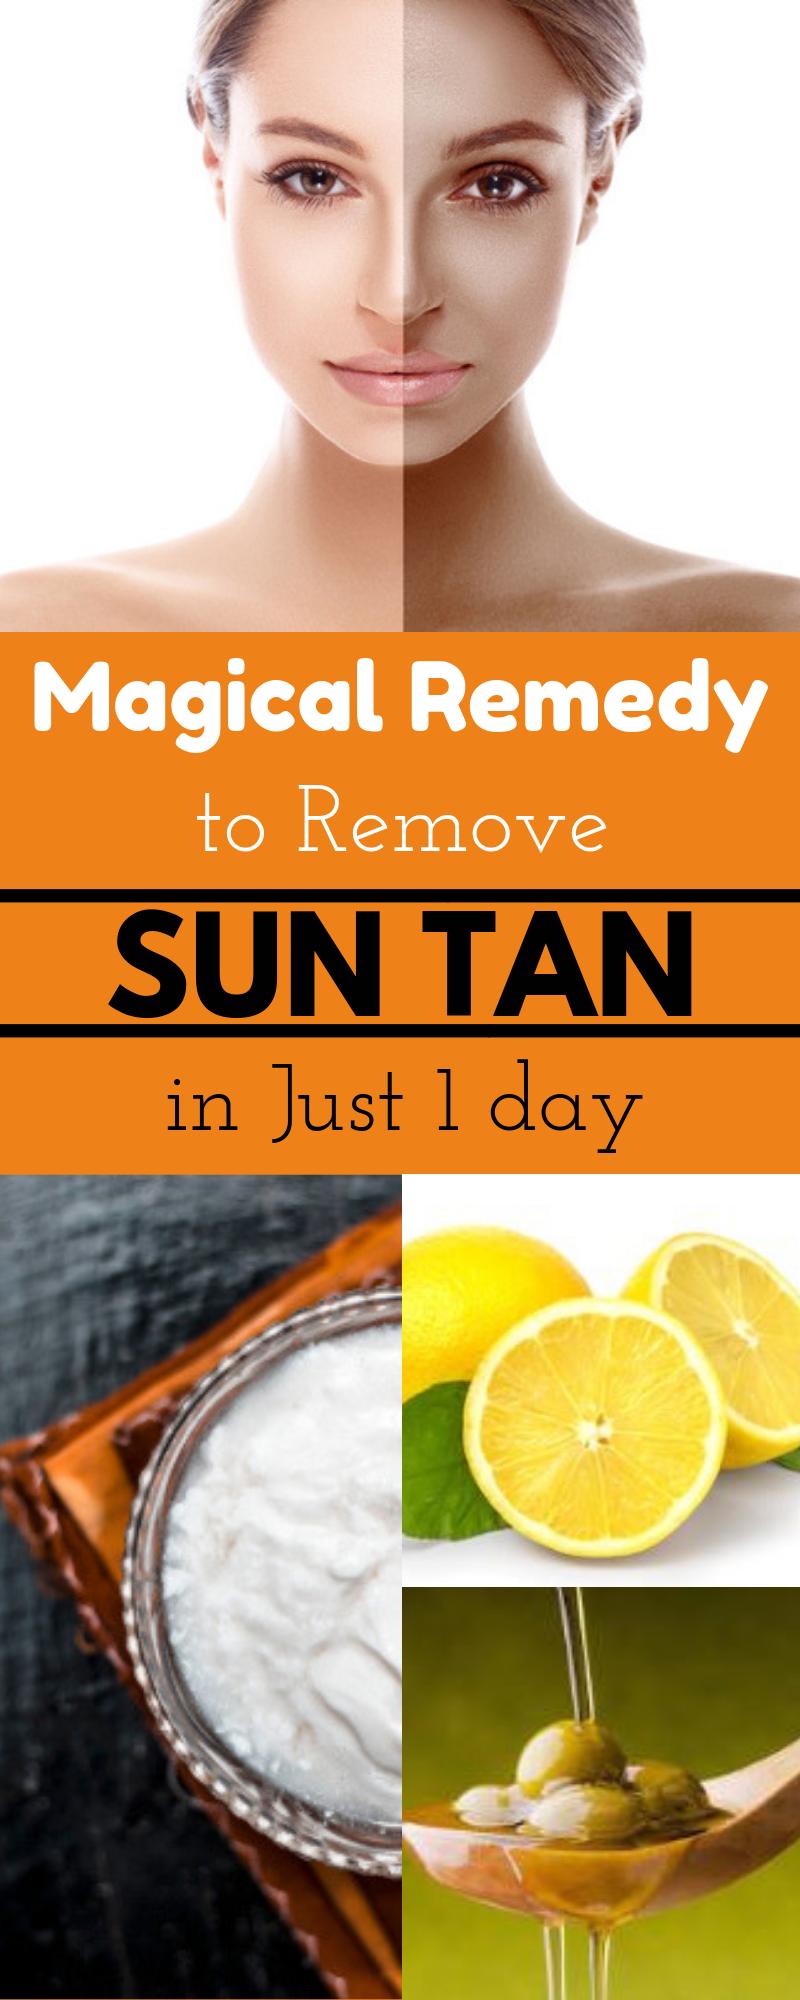 0c1505de855485d1ee1cedb33a22141b - How To Get Rid Of Sun Tan On Brown Skin